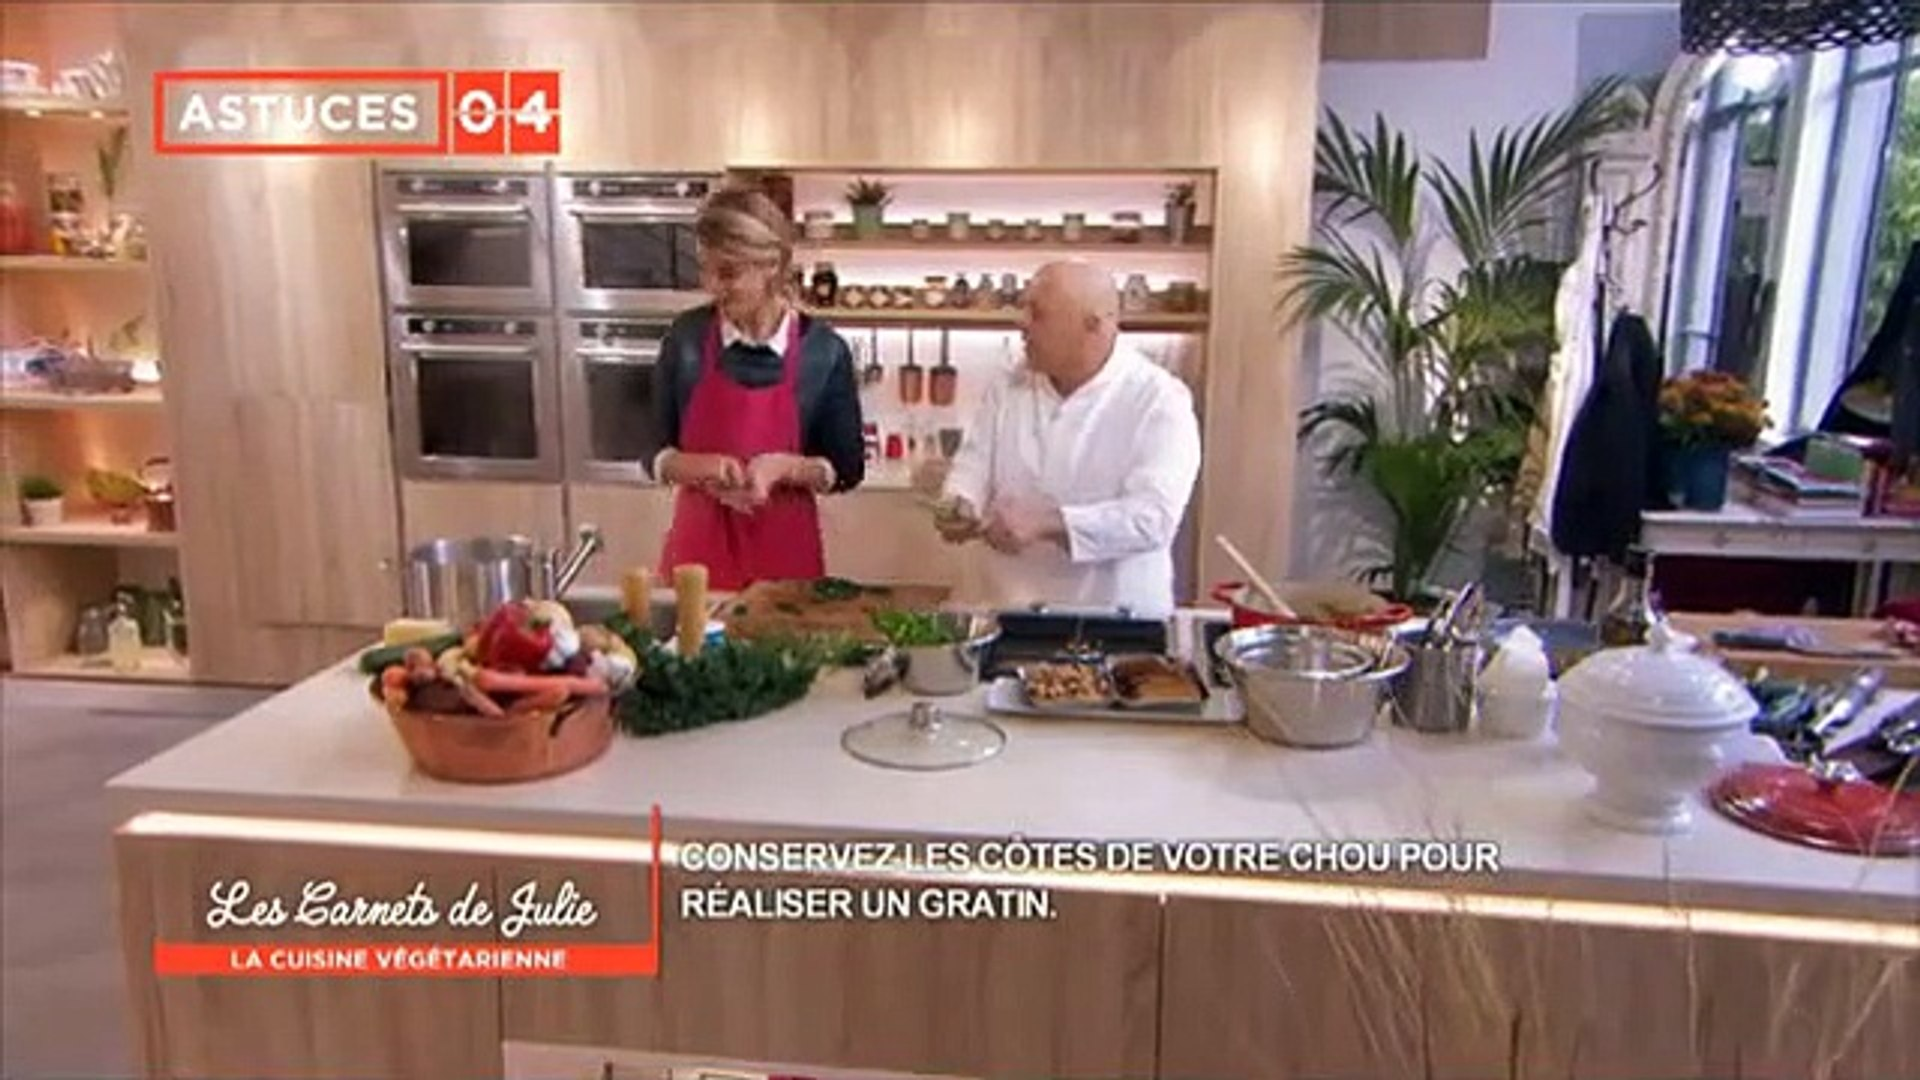 Cuisine Vegetarienne Les Carnets De Julie G10 U1bjkfw Video